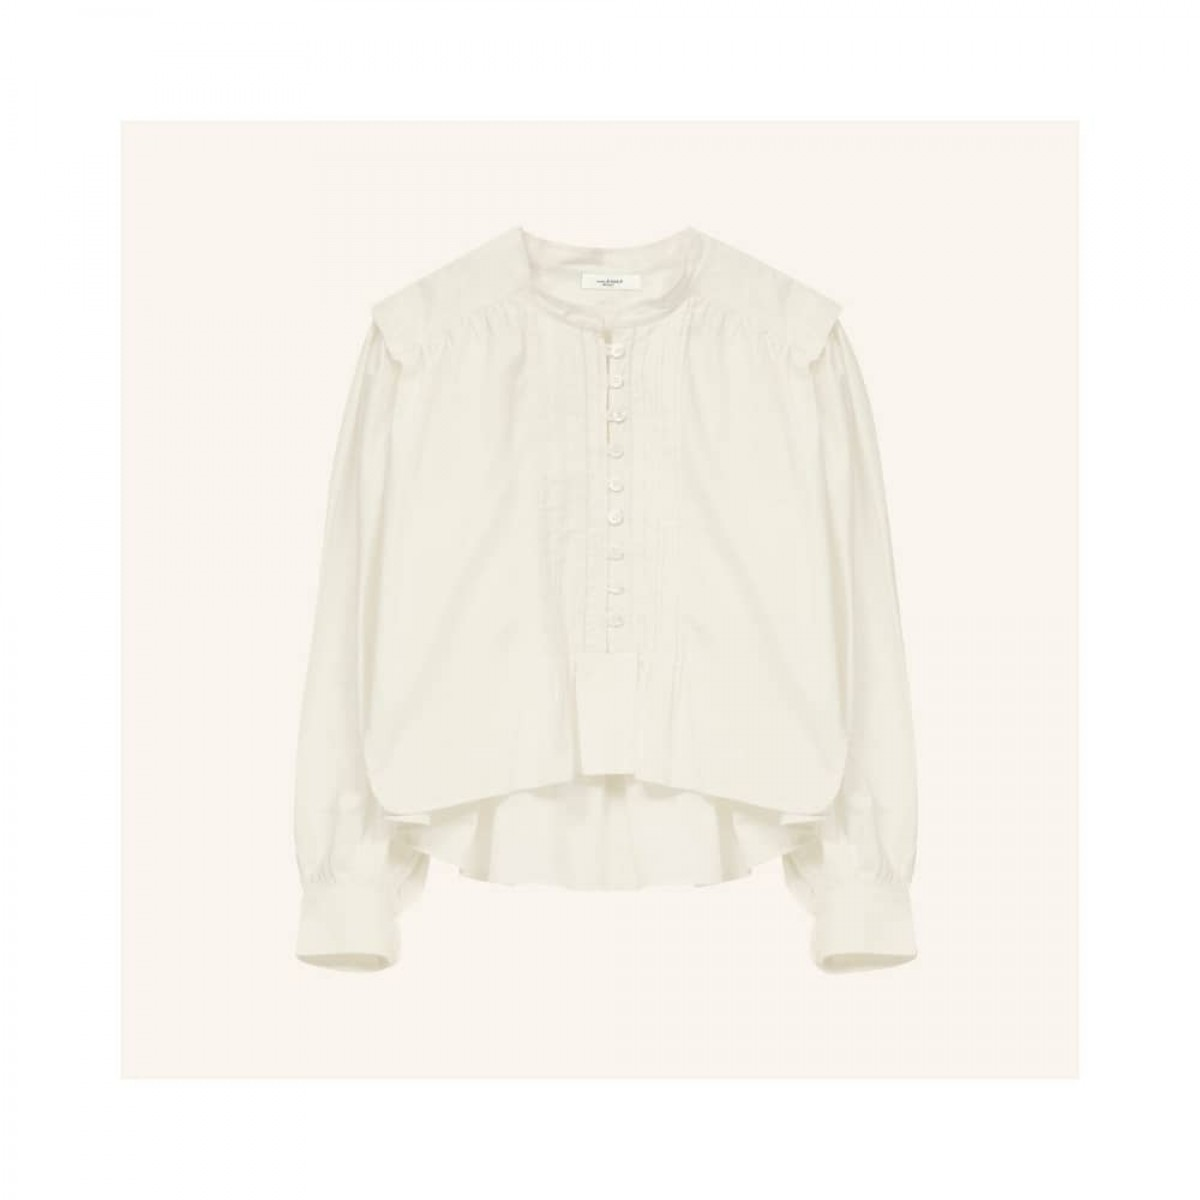 okina top - white - front